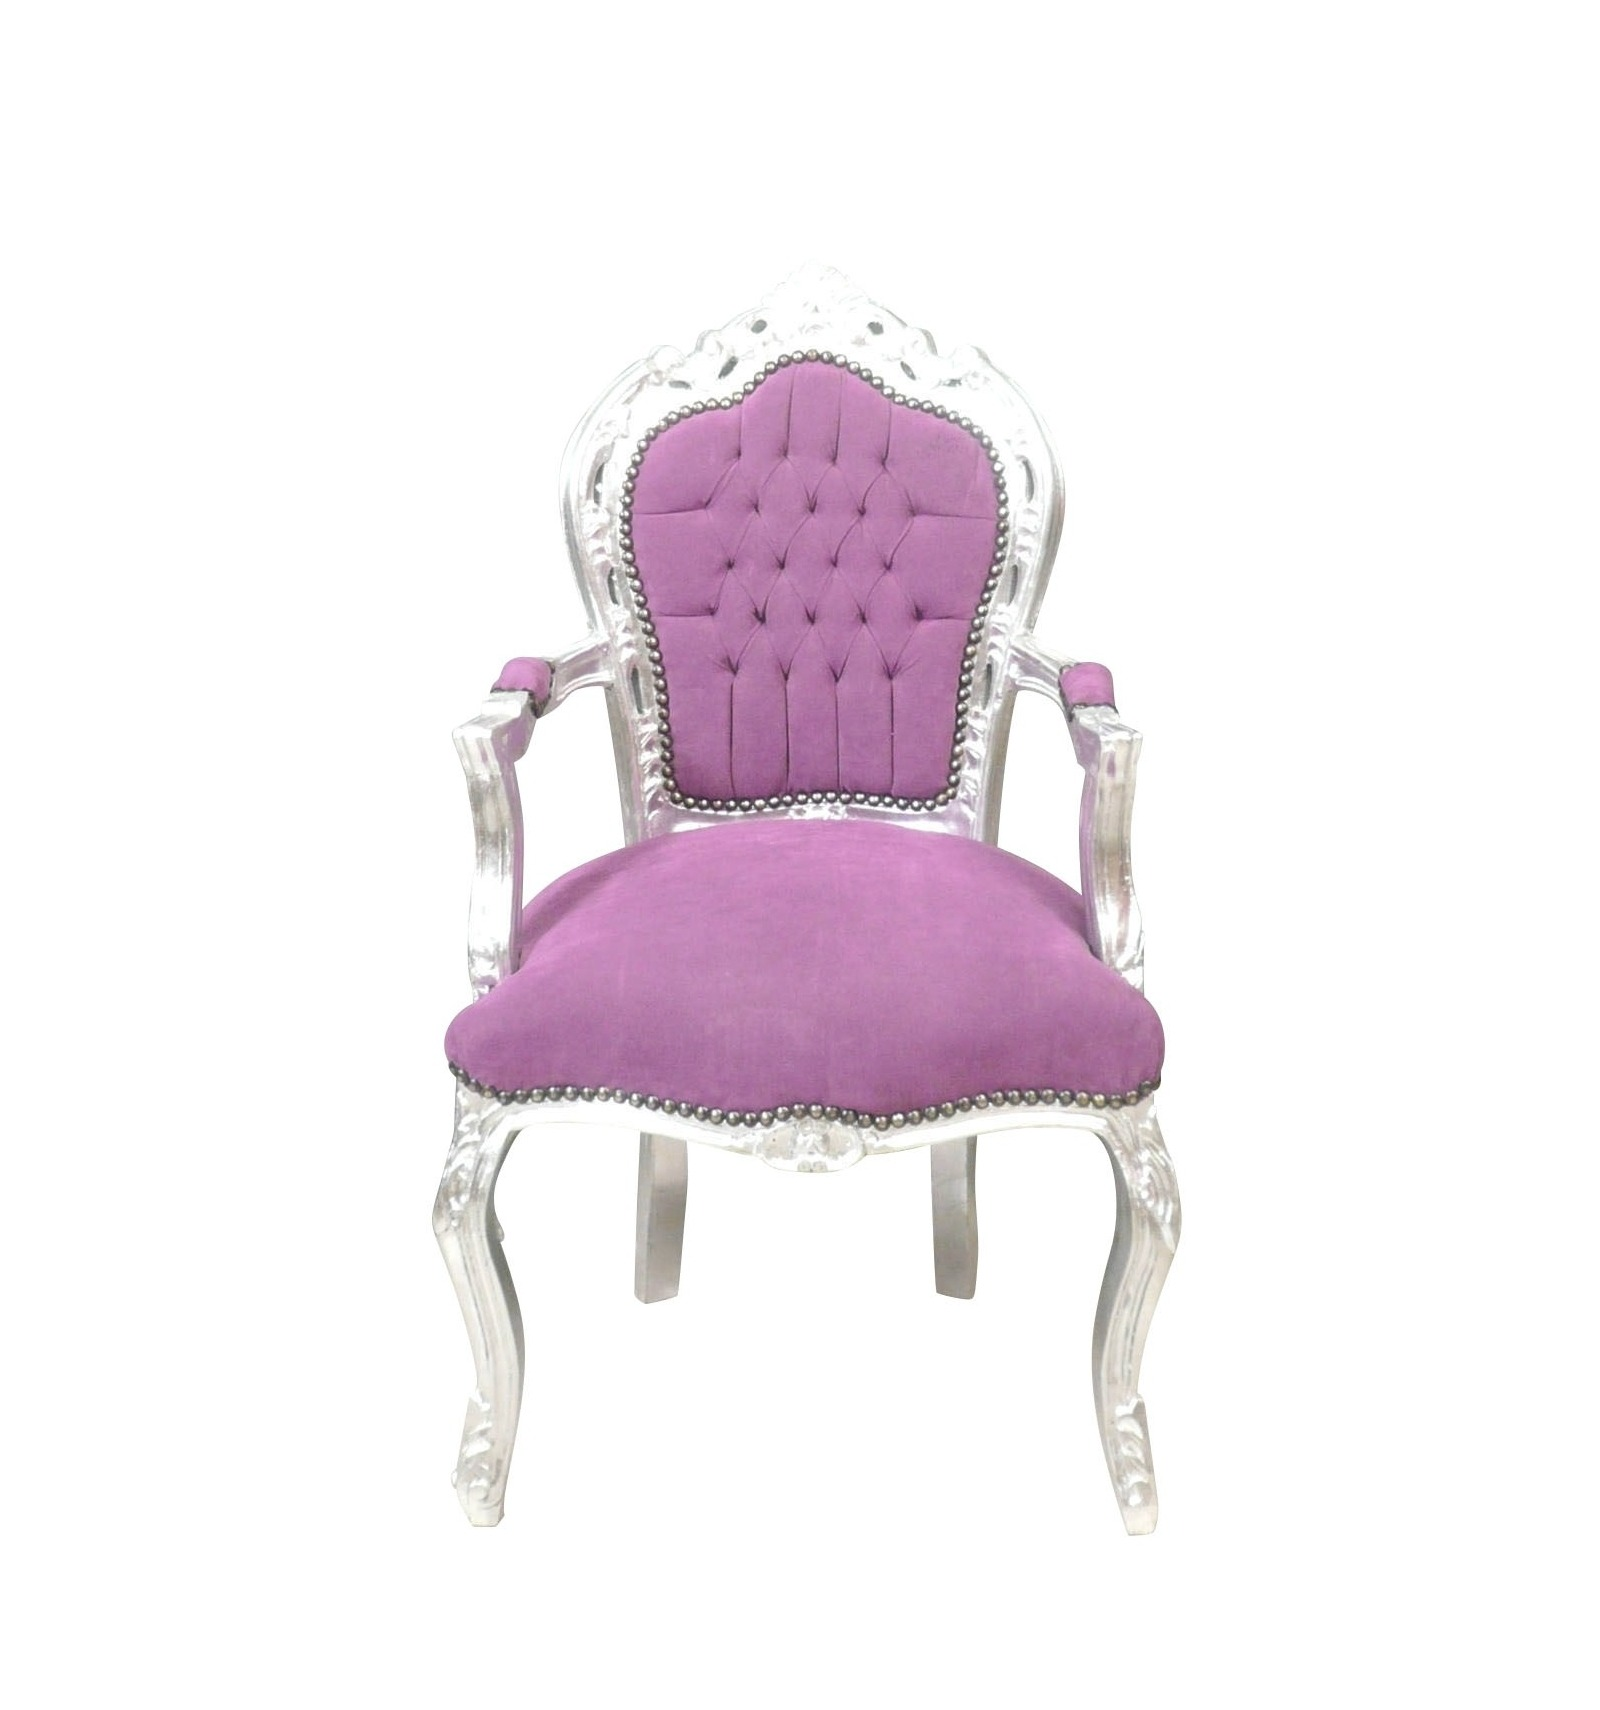 fauteuil baroque classique mauve. Black Bedroom Furniture Sets. Home Design Ideas